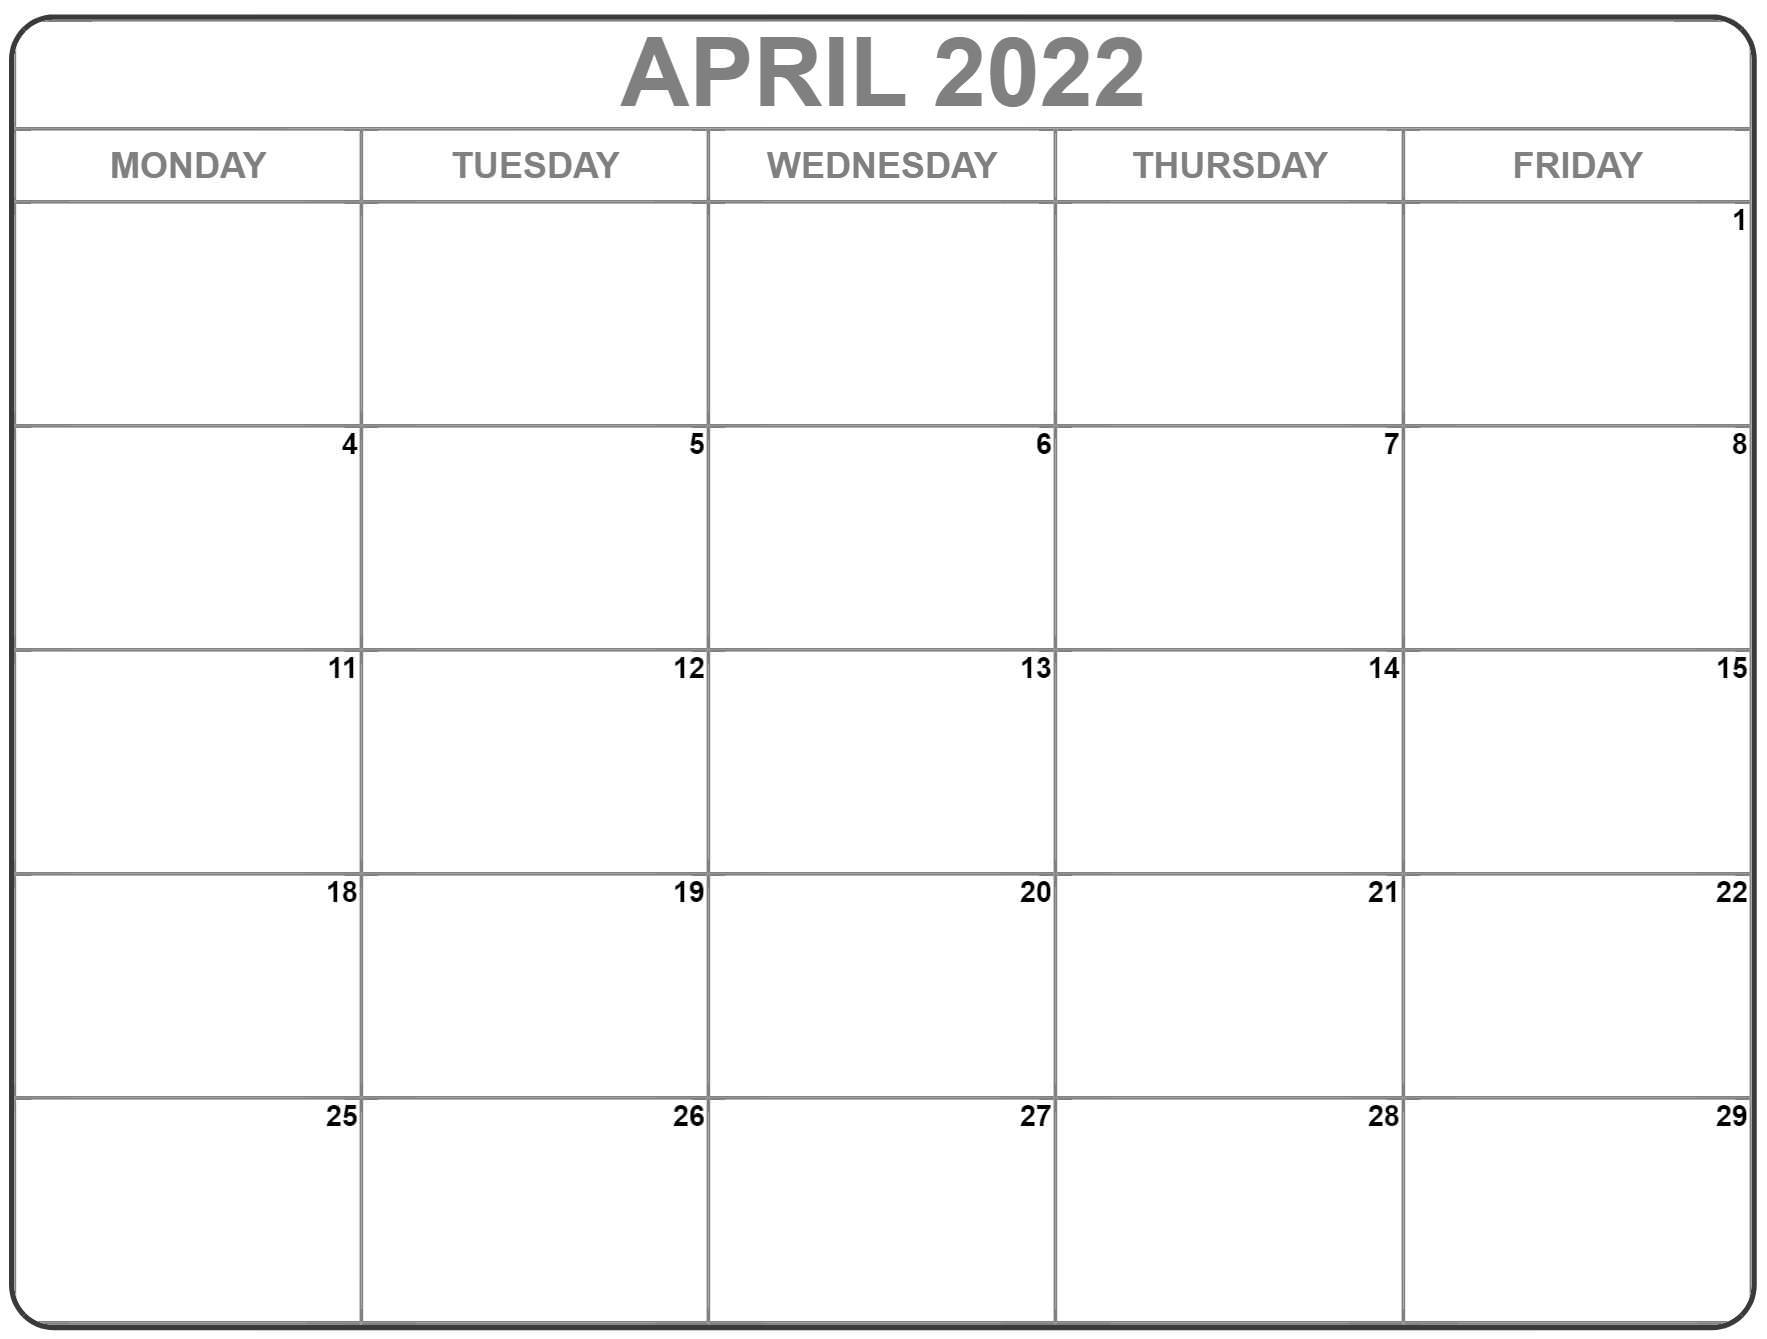 April 2022 Monday Calendar | Monday To Sunday for Free Monday Through Friday Calendar Template